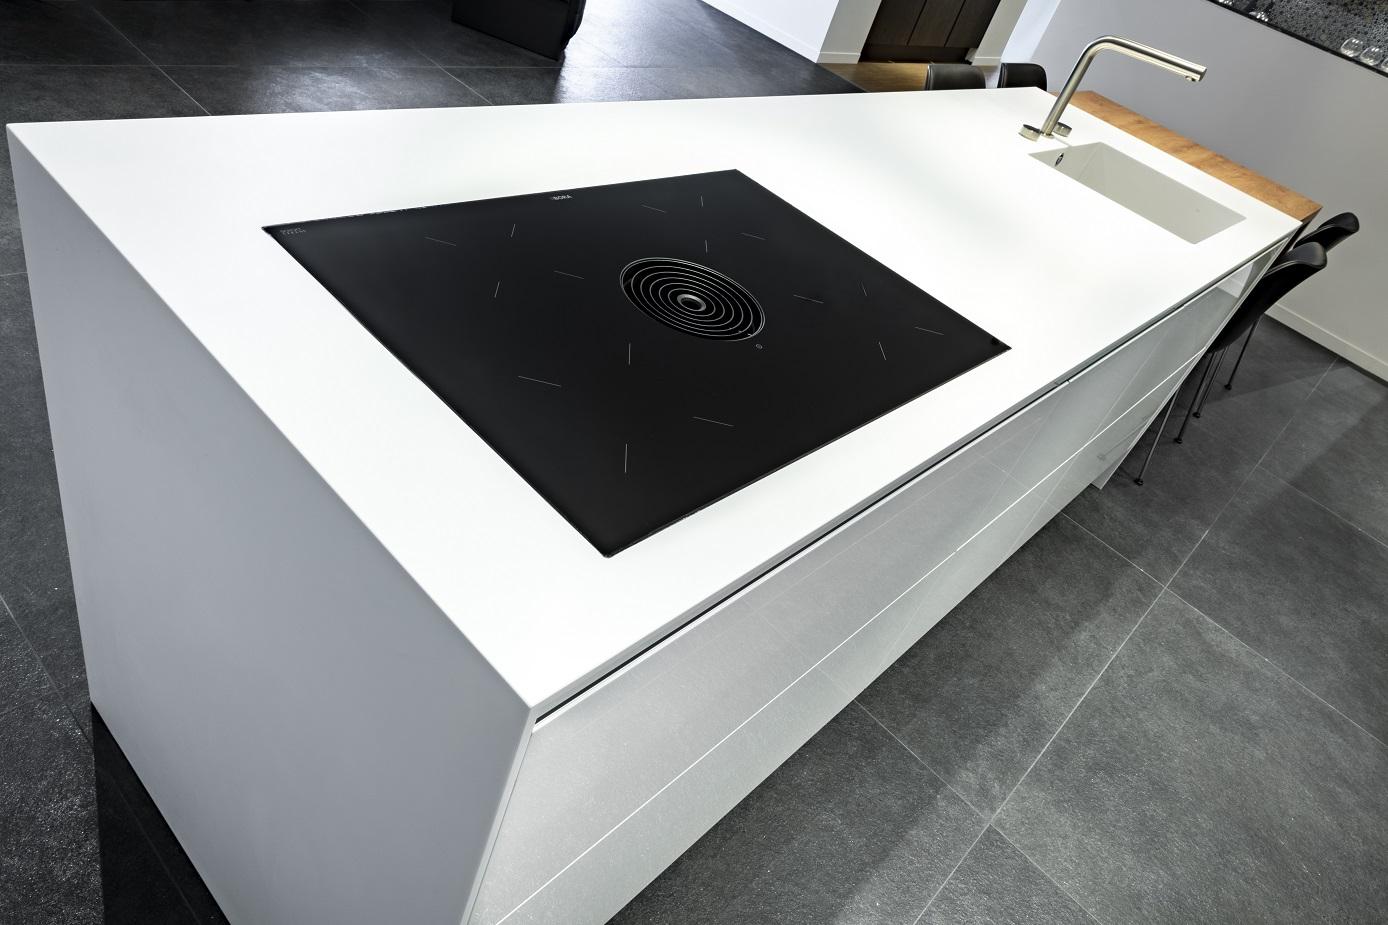 CORA Worktop - Corian monoblock - Showroomkeuken 1 - Au Four Design for Life